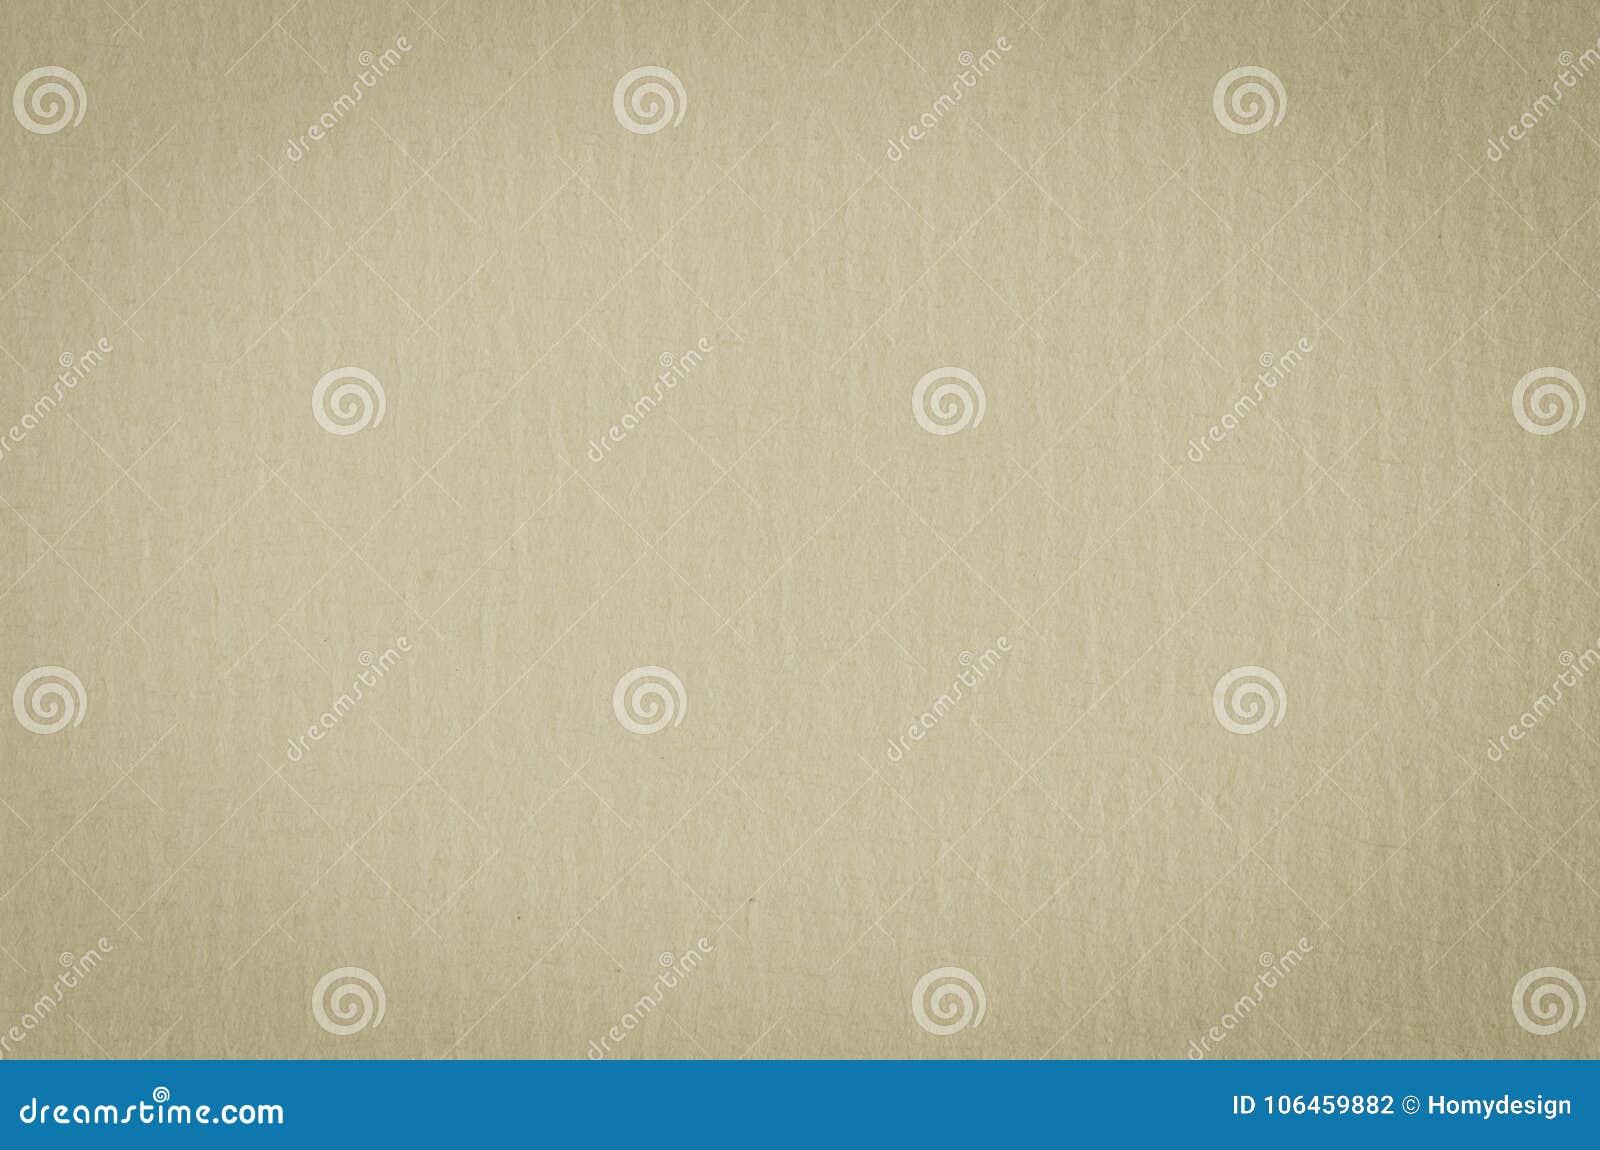 Cream Textured Paper Stock Photo Image Of Pattern Linen